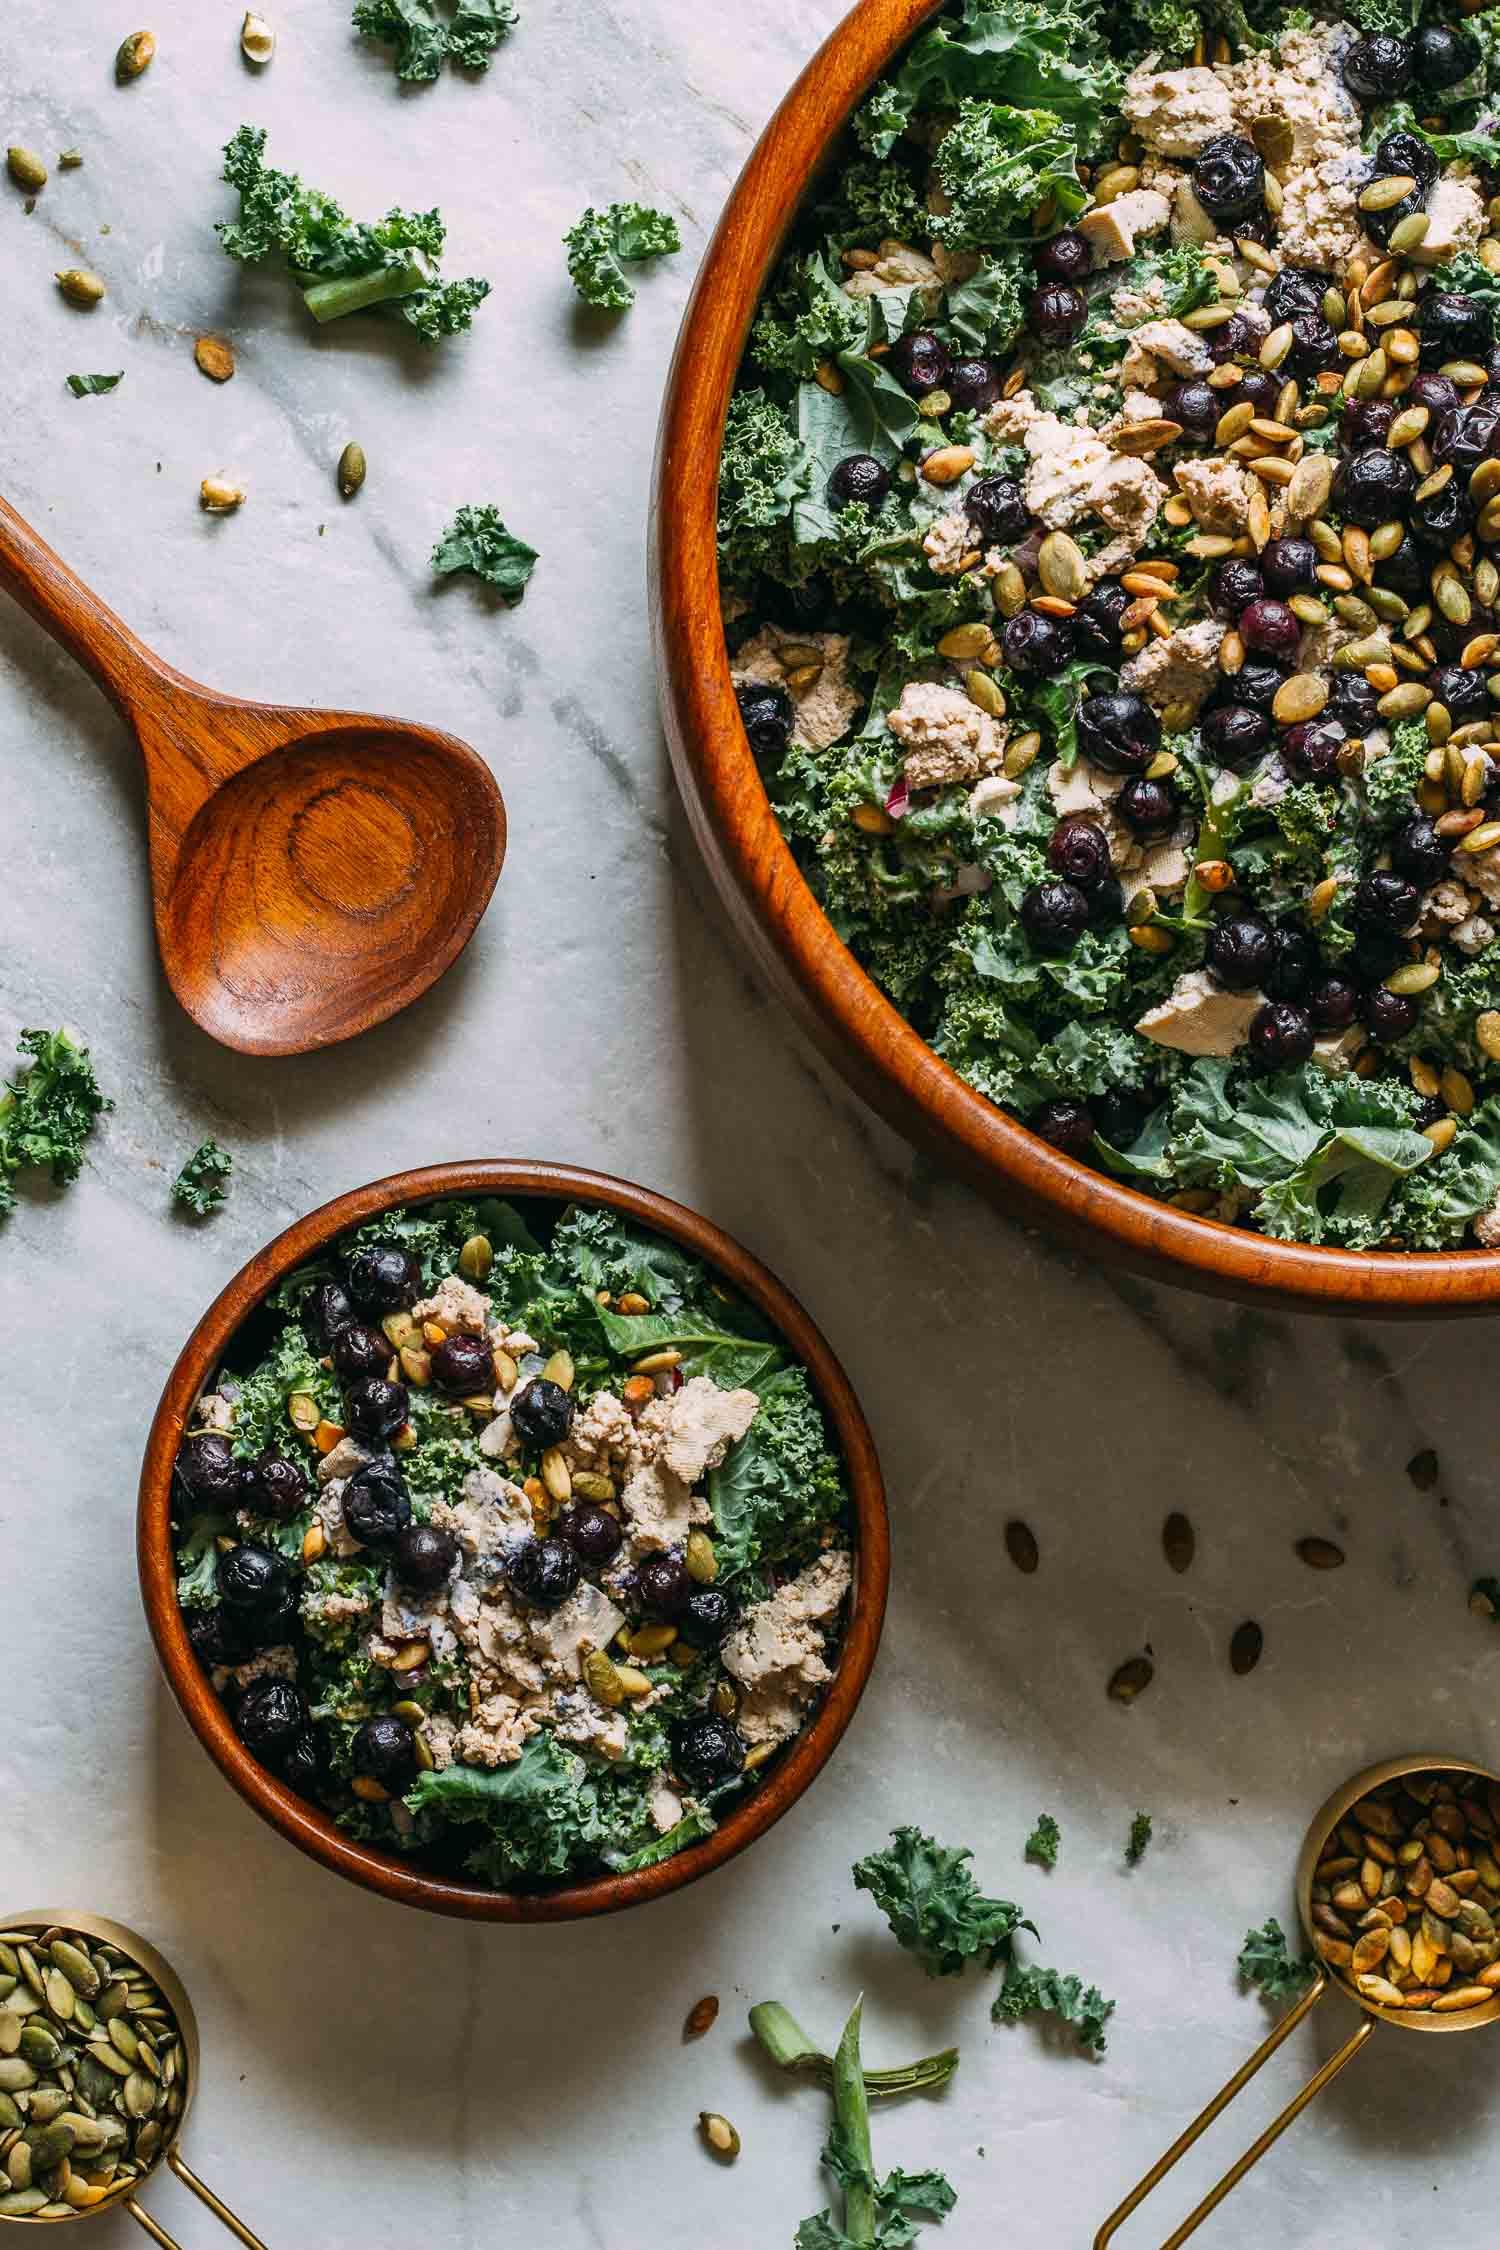 Blueberry Kale Pumpkin Seed Salad #blueberry #kale #pepita #pumpkin #seed #nut-free #oil-free #gluten-free #salad #recipe